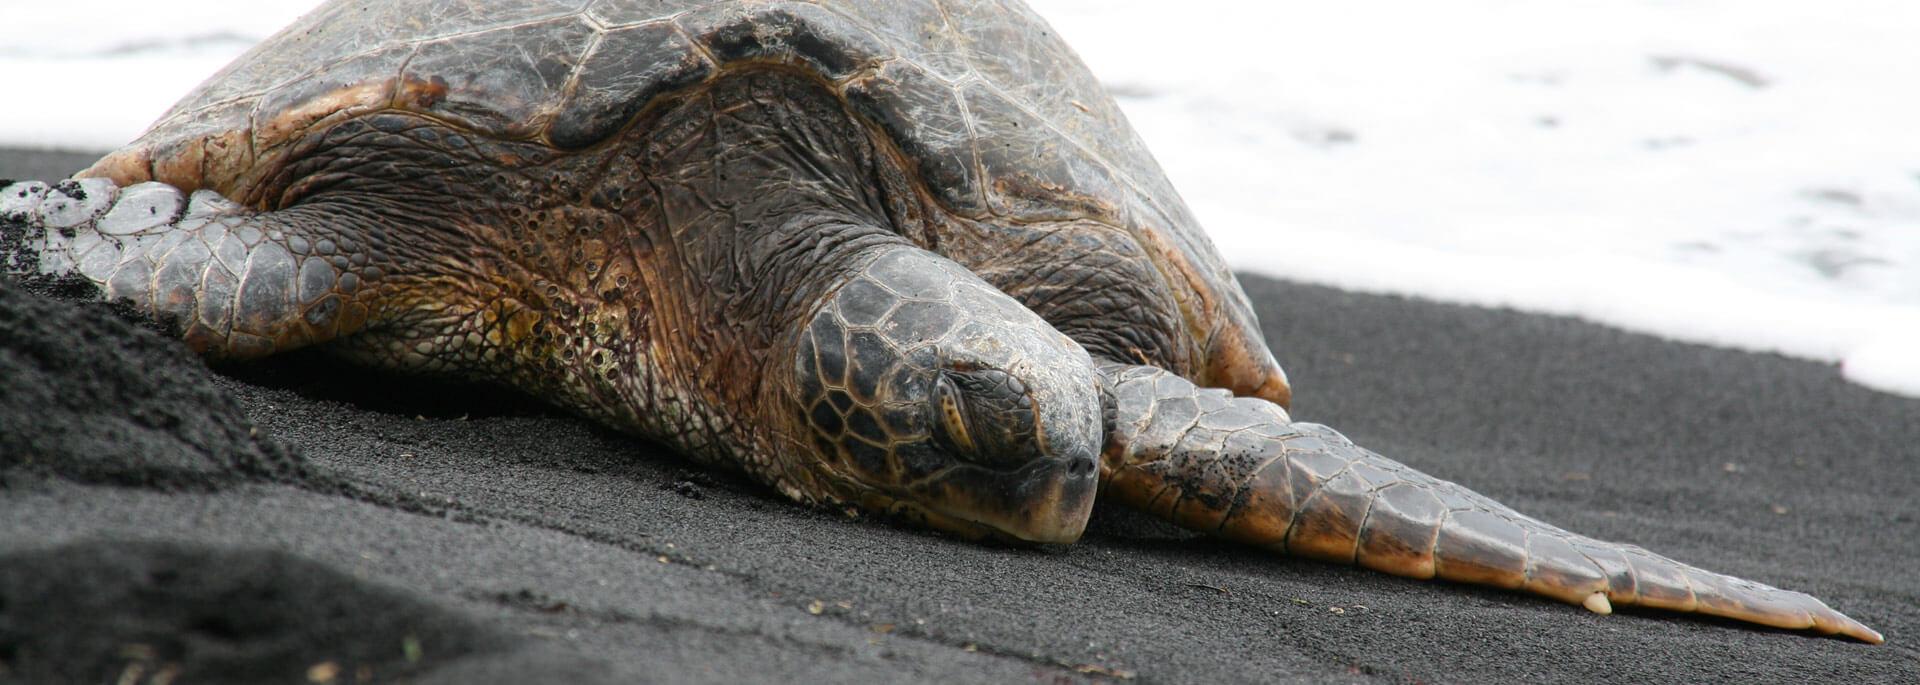 Fotos: Punalu'u Schildkröten auf Hawaii